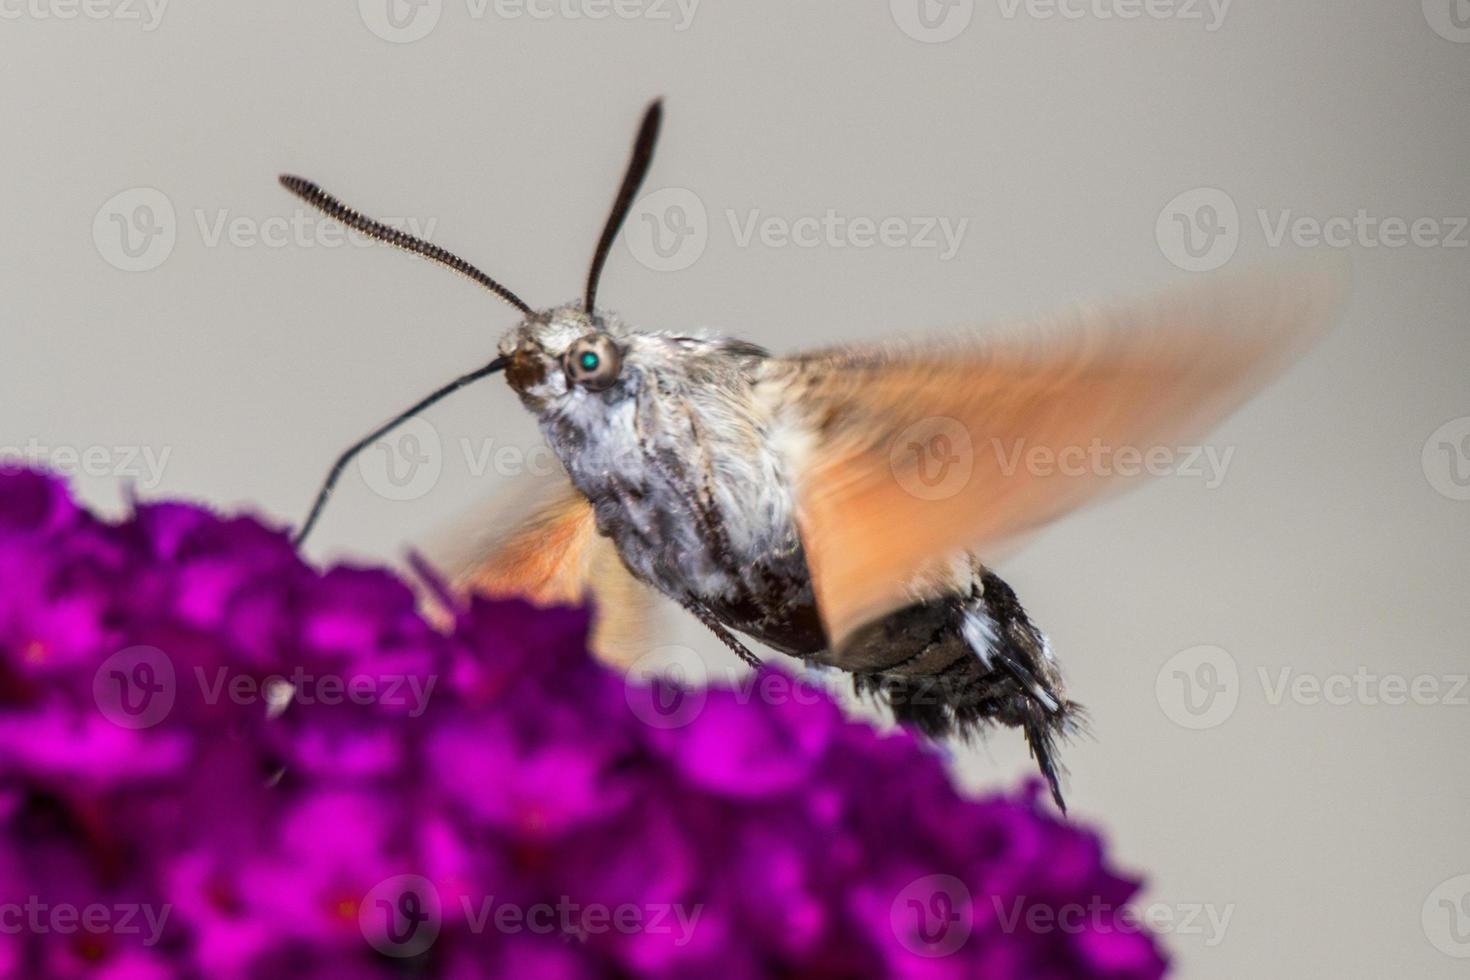 Hummingbird hawk-moth on Buddleja Davidii photo